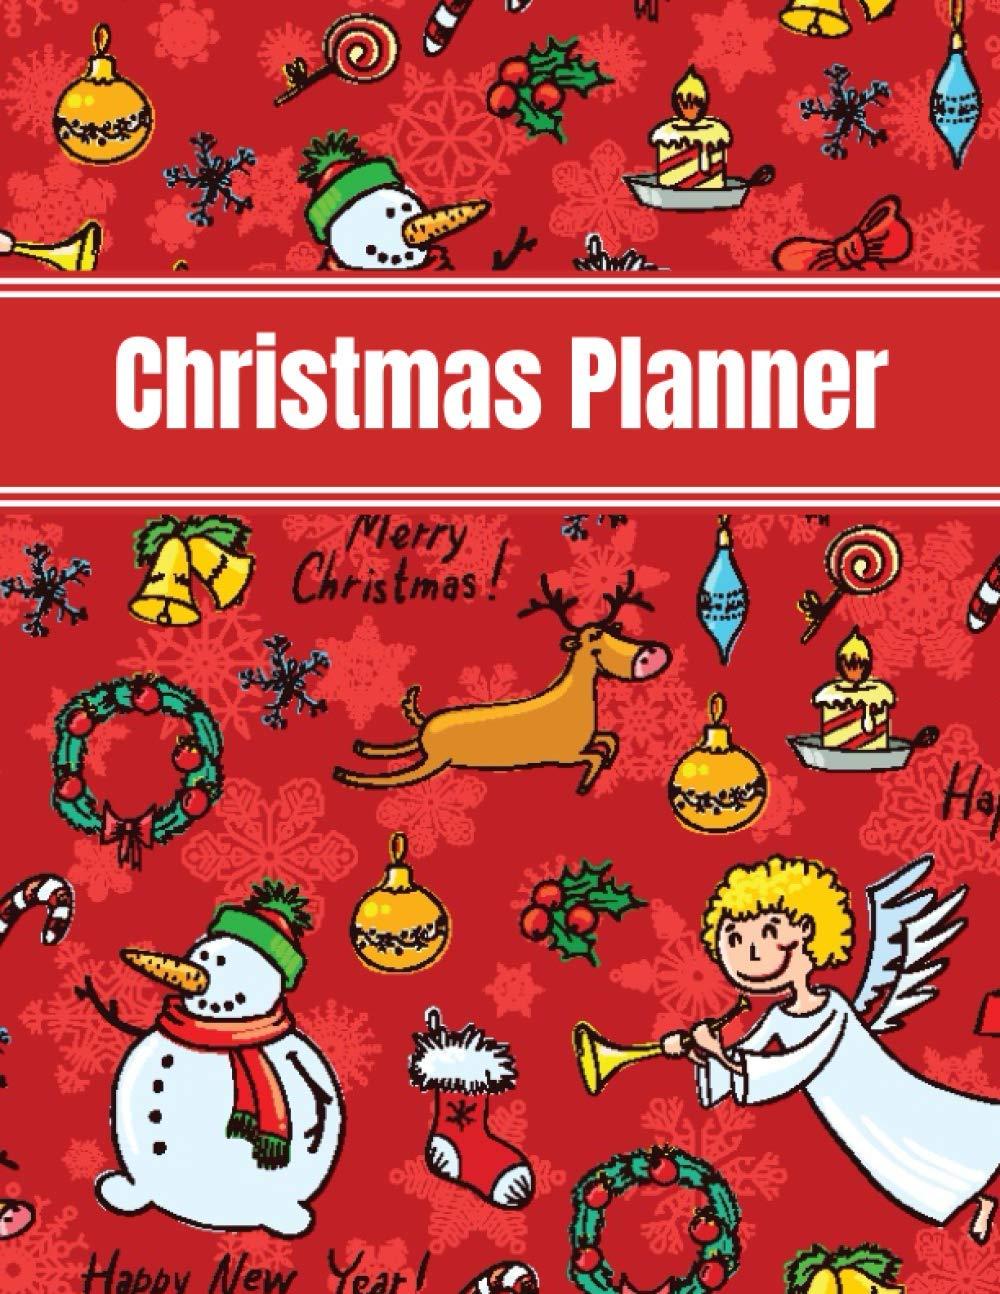 Christmas Planner 2020 Christmas Gift List Planner Organiser Holiday Planner To Do Lists Shopping Gift Present Bear Cover Design Happy Trendy Planner 9798696352367 Amazon Com Books